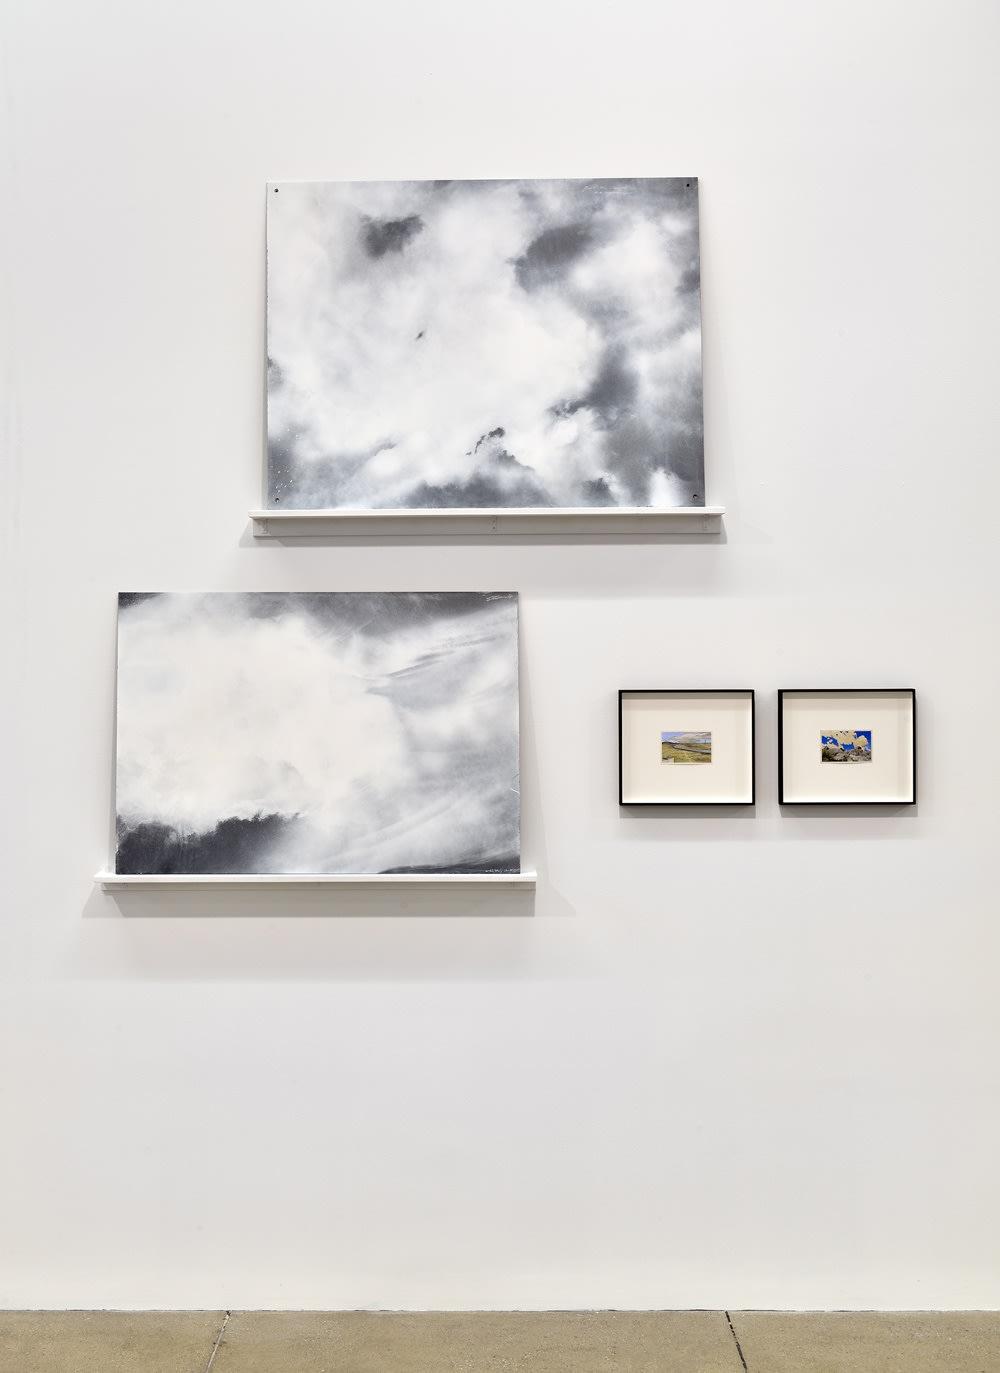 Tacita Dean … my English breath in foreign clouds